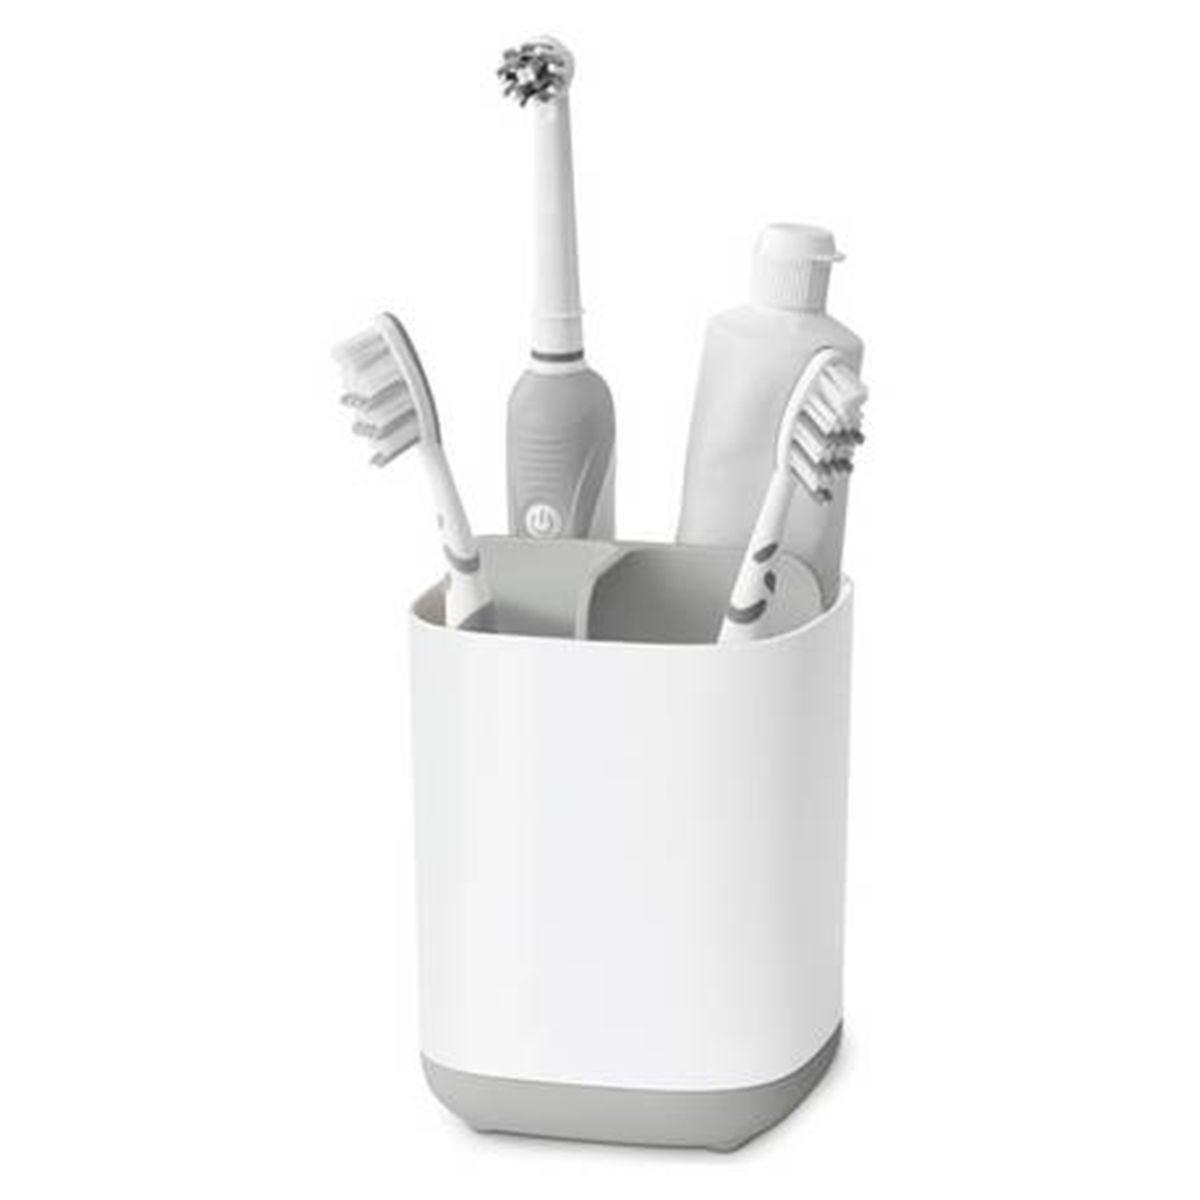 Joseph Joseph EasyStore Toothbrush Caddy Small - Grey/White